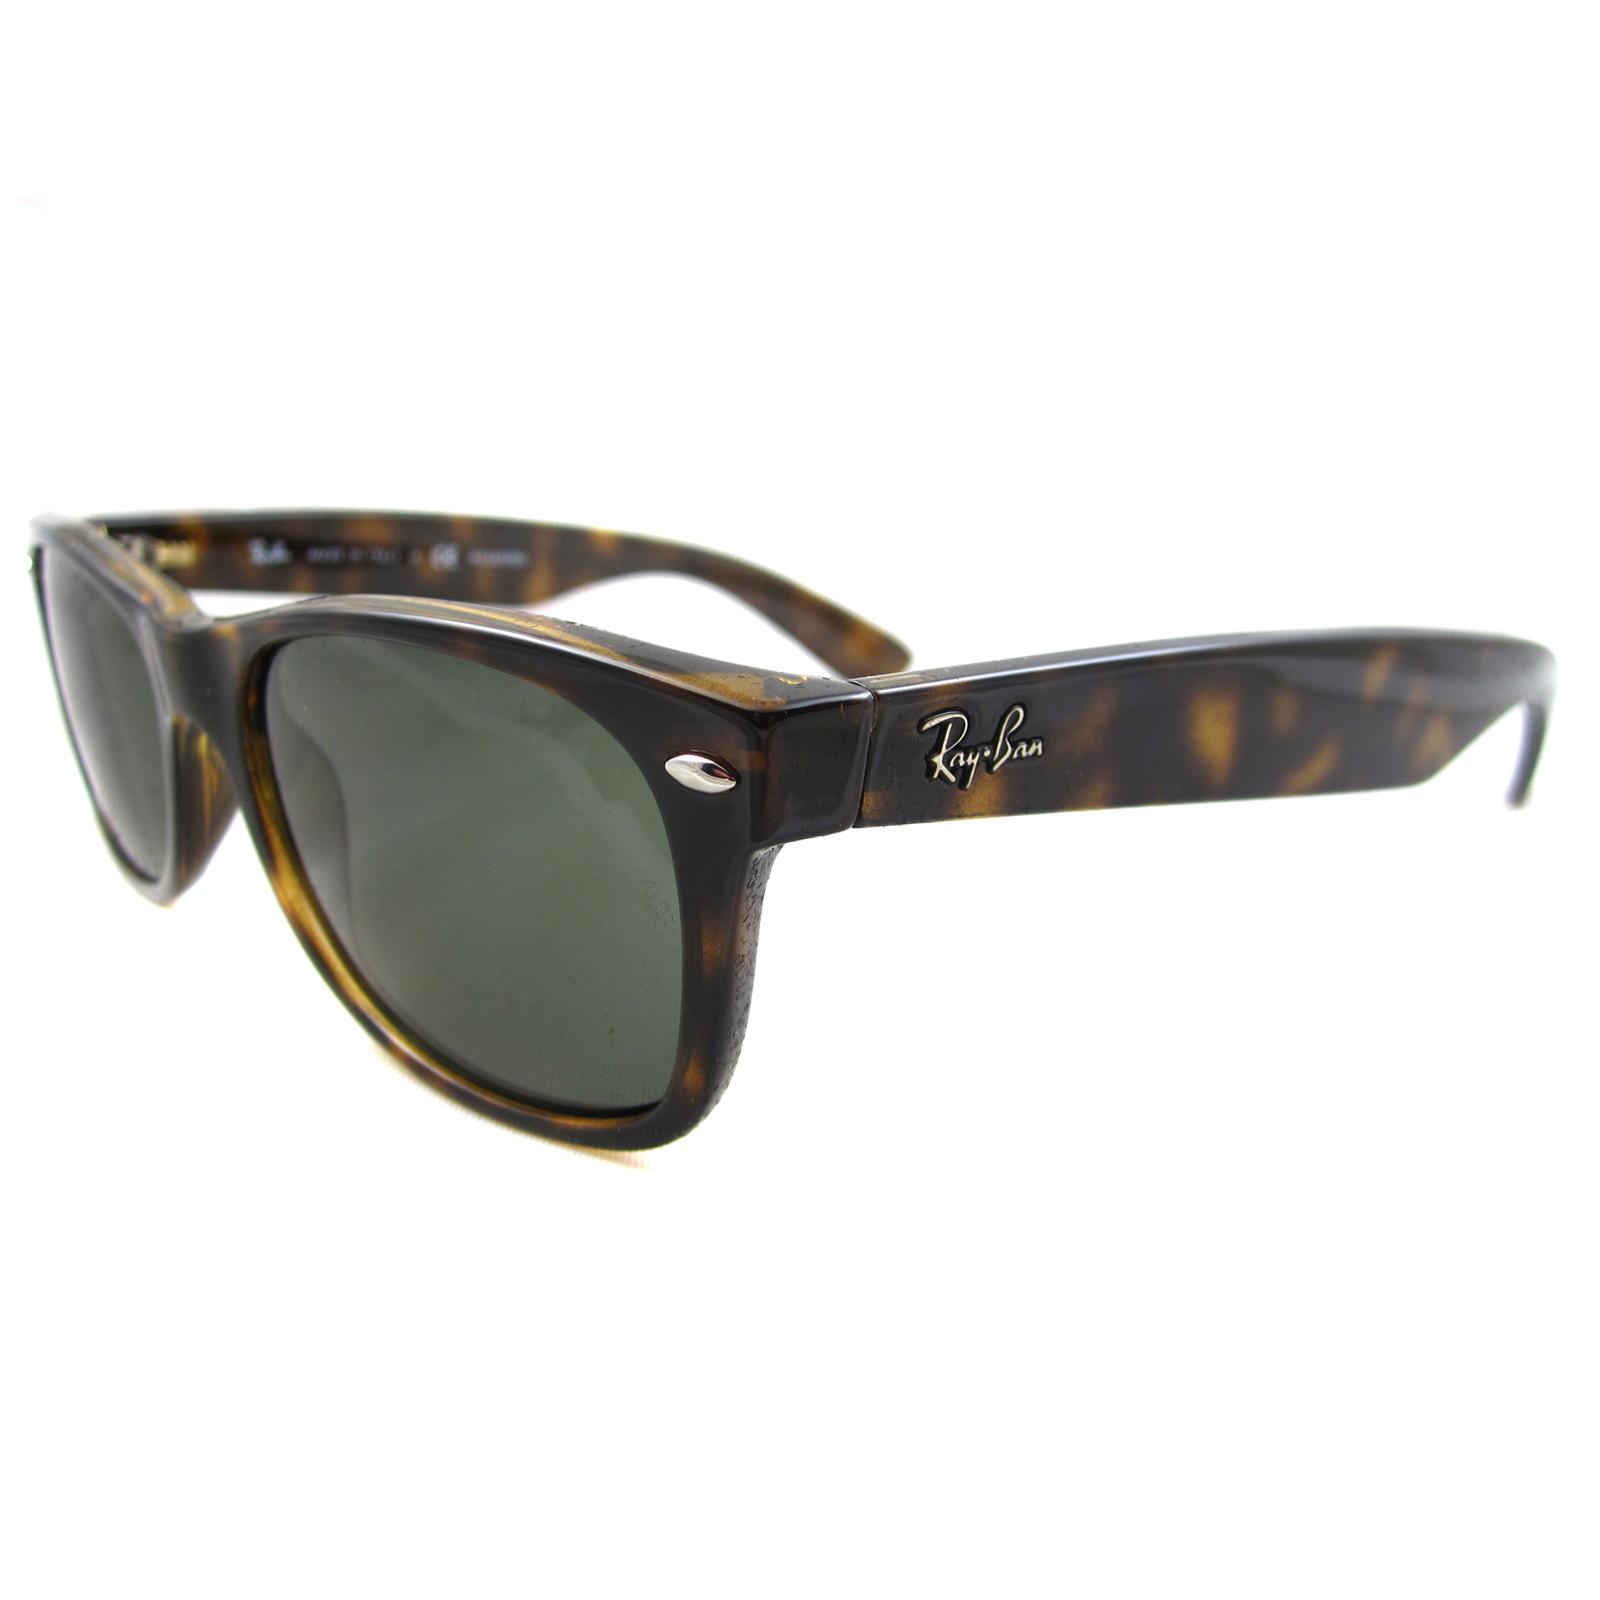 cf0efb51ec7c9 Sentinel Ray-Ban Sunglasses New Wayfarer 2132 902 58 Tortoise Green  Polarized